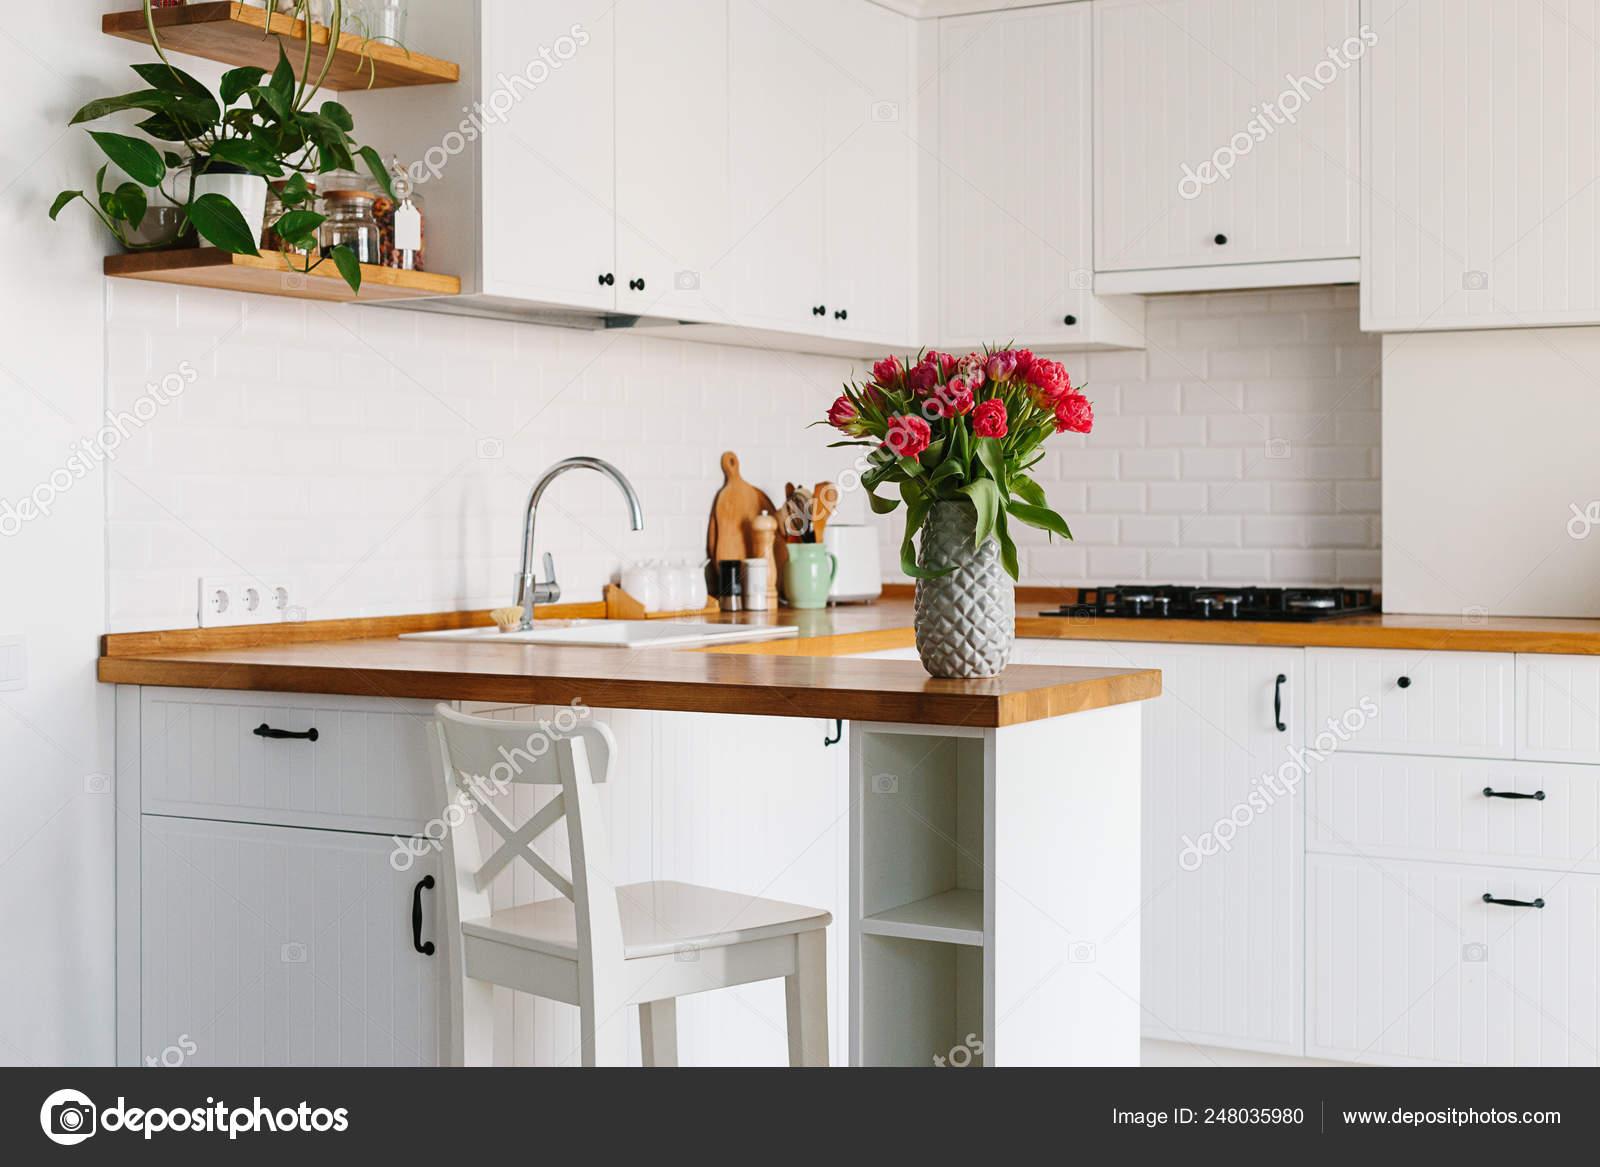 Tulips Bouquet In Vase Standing On Wooden Countertop In The Kitchen Modern White U Shaped Kitchen In Scandinavian Style Stock Photo C Switlanasymonenko 248035980,King Bedroom Furniture Sets